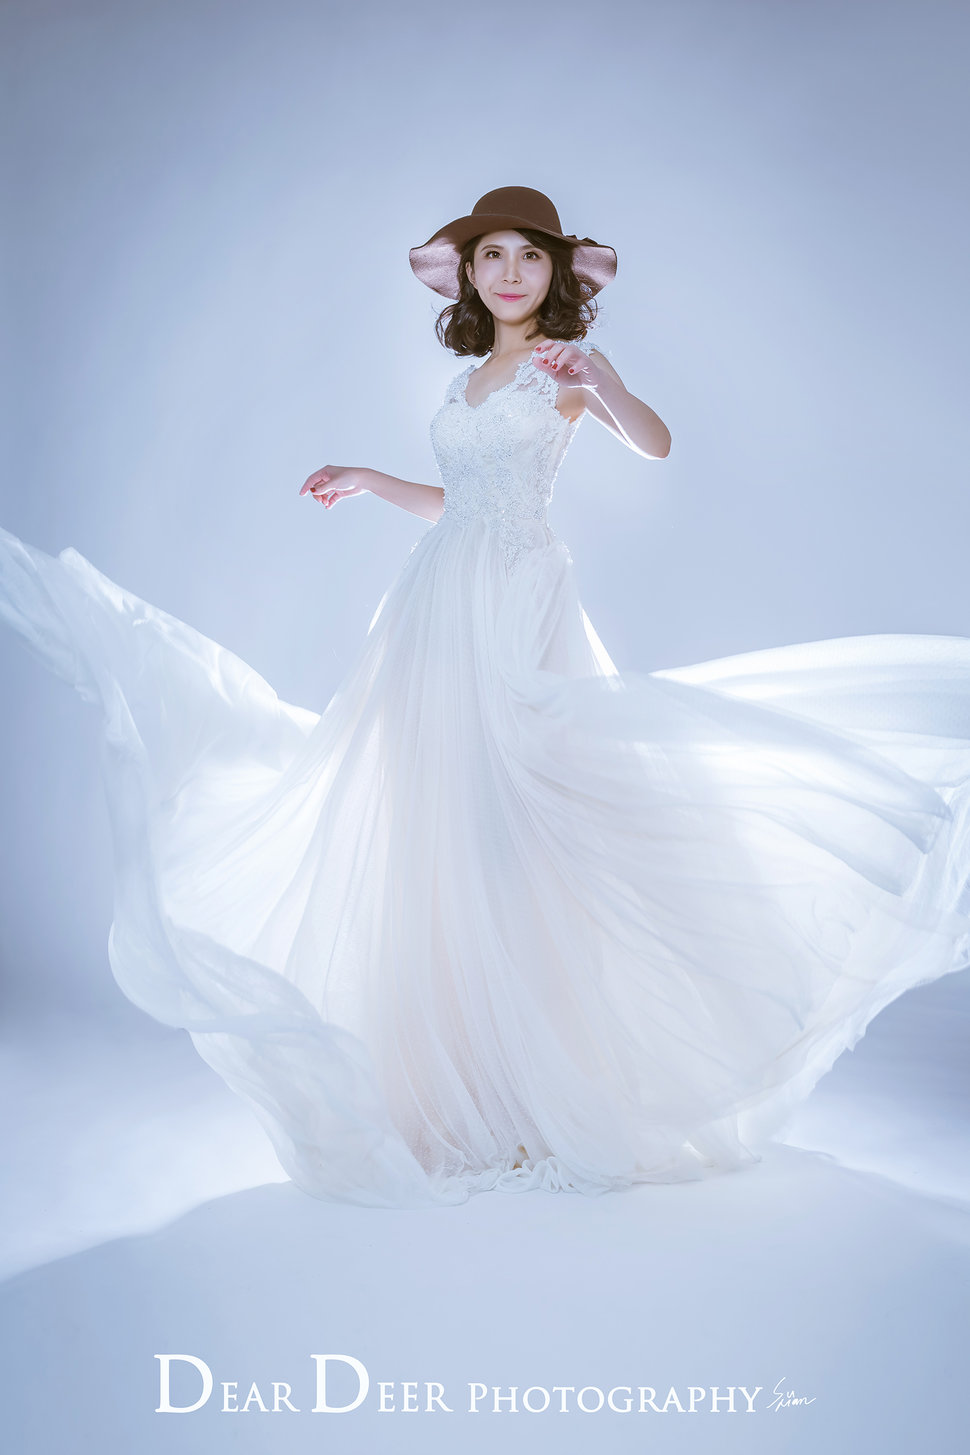 Dear Deer|經典韓系棚拍(編號:2403899) - Dear Deer鹿兒攝影|女攝影師蘇蔓 - 結婚吧